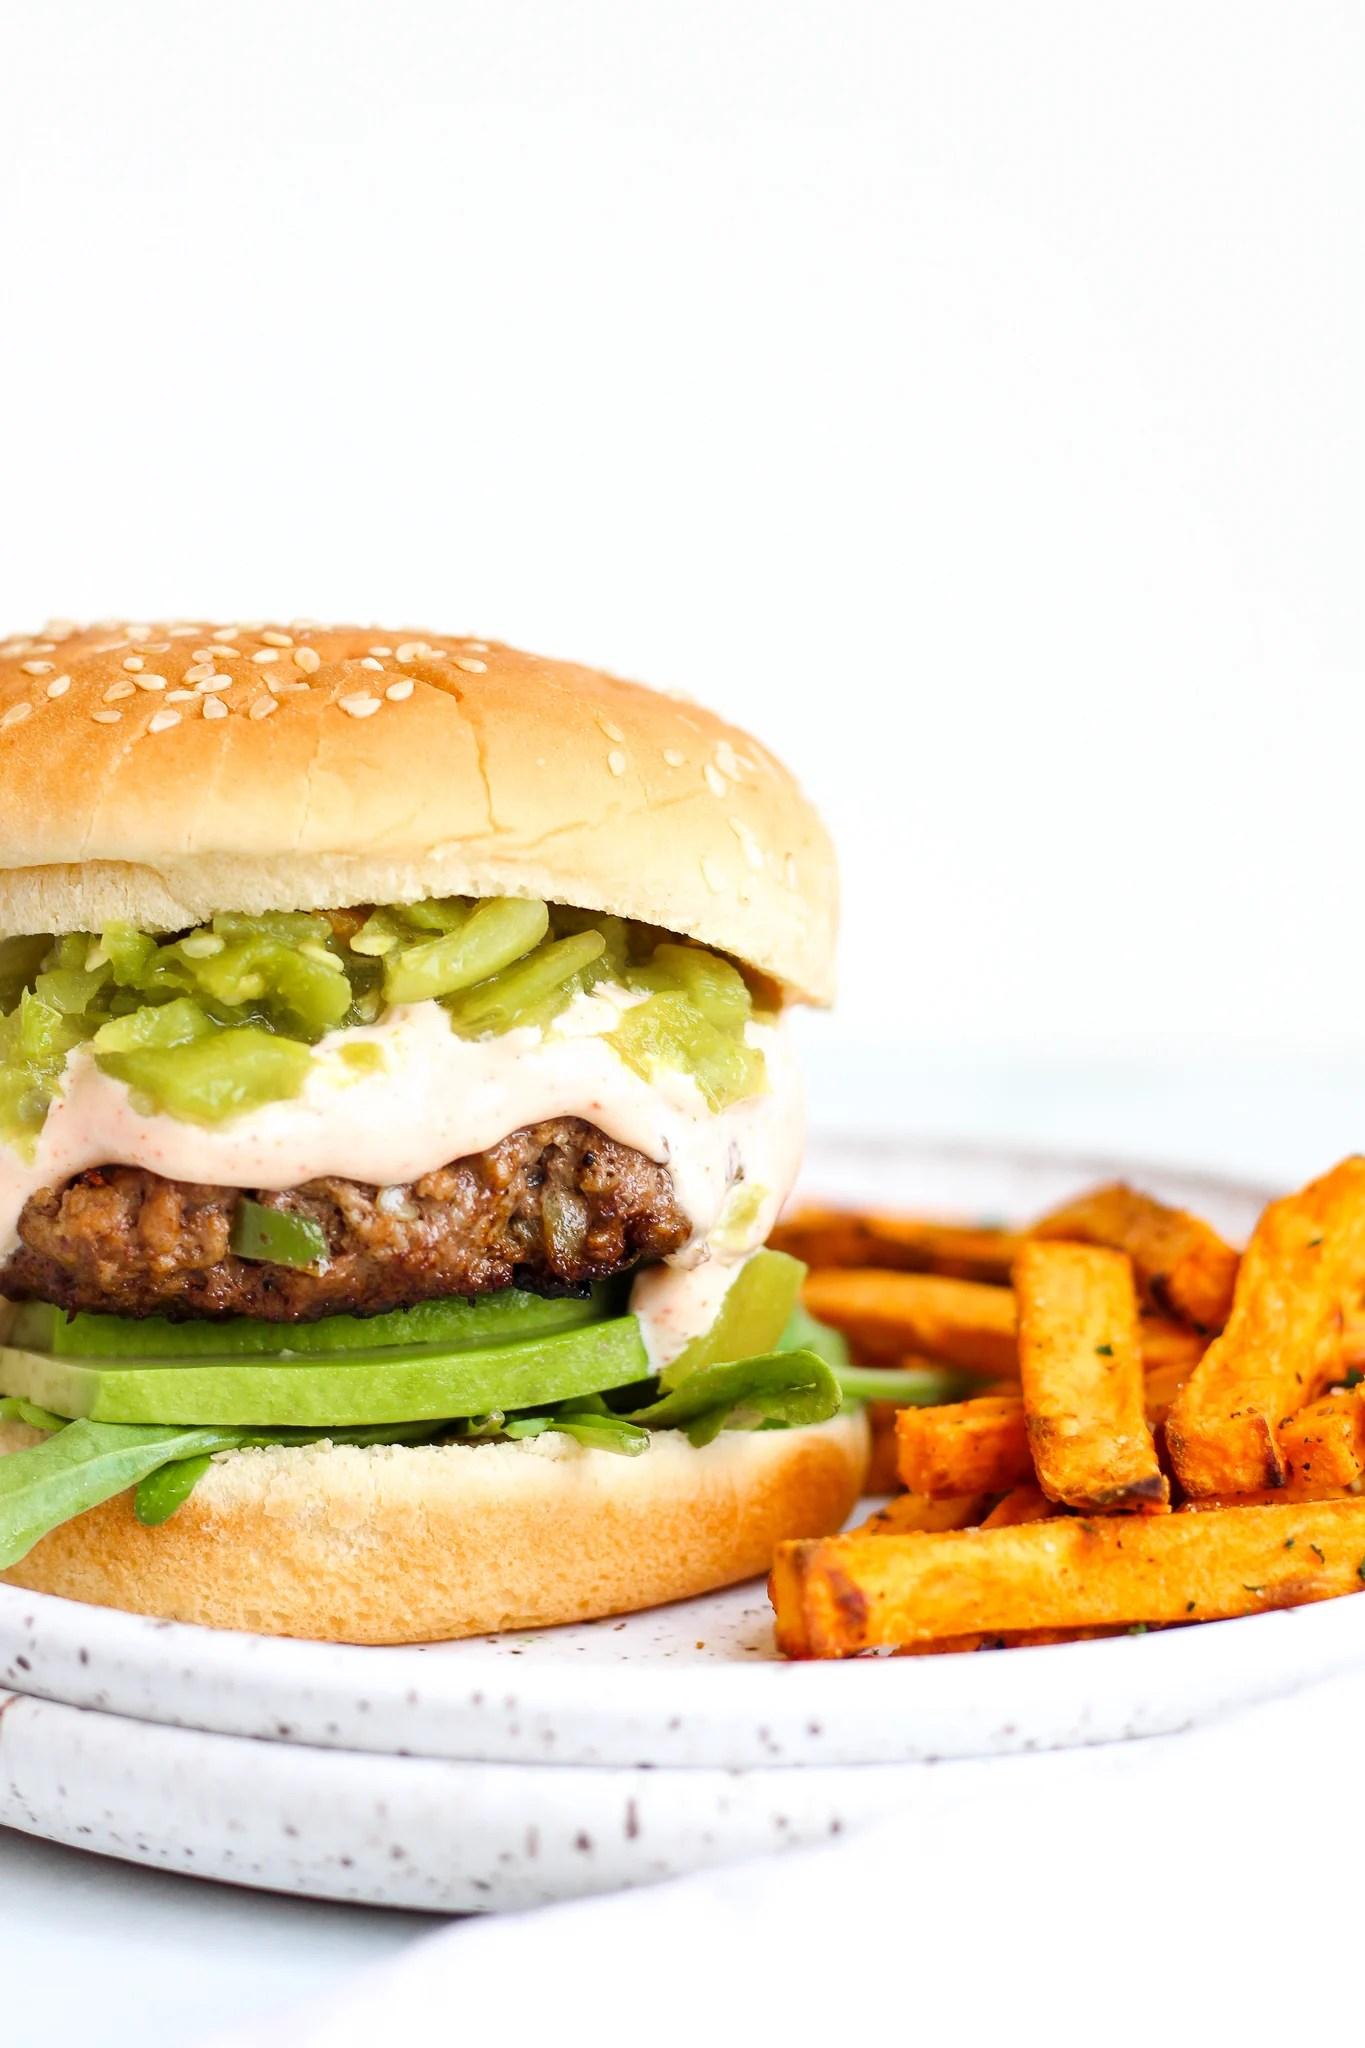 Green Chile burger on a sesame seed bun on a white ceramic plate served alongside homemade sweet potato fries